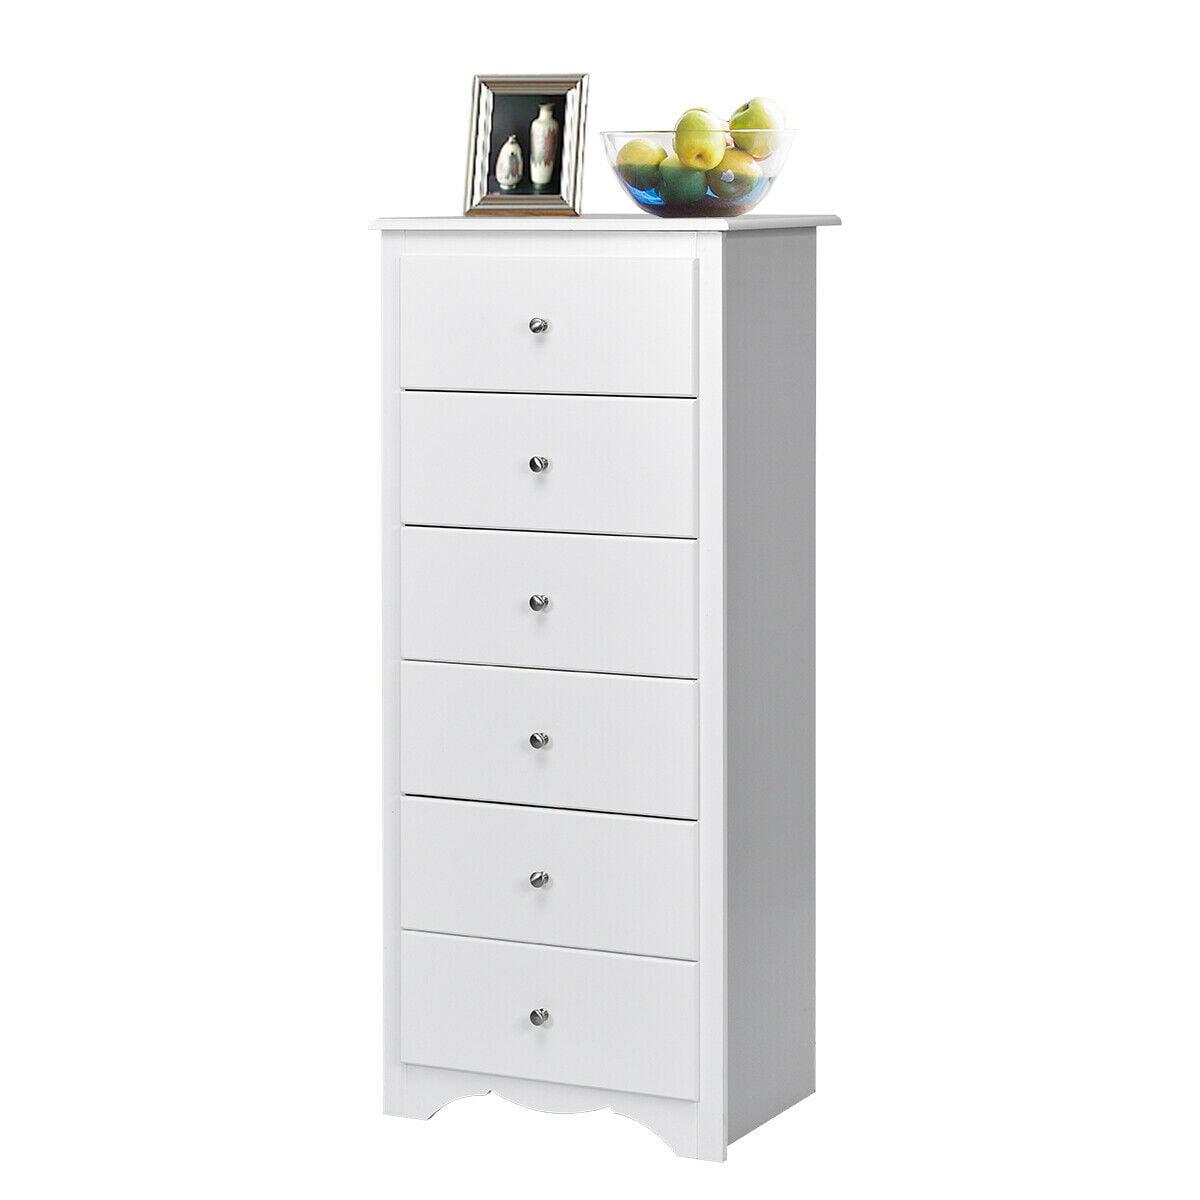 Gymax 6 Drawer Chest Dresser Clothes Storage Bedroom Tall Furniture Cabinet White - Walmart.com ...